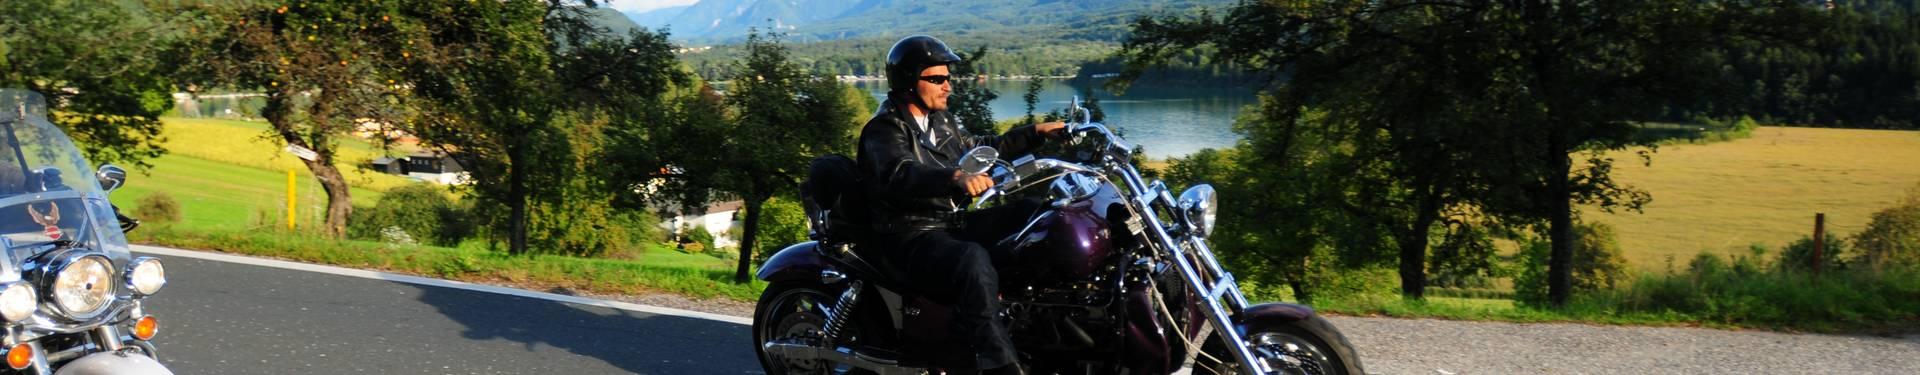 Motorradfahren in Kärnten